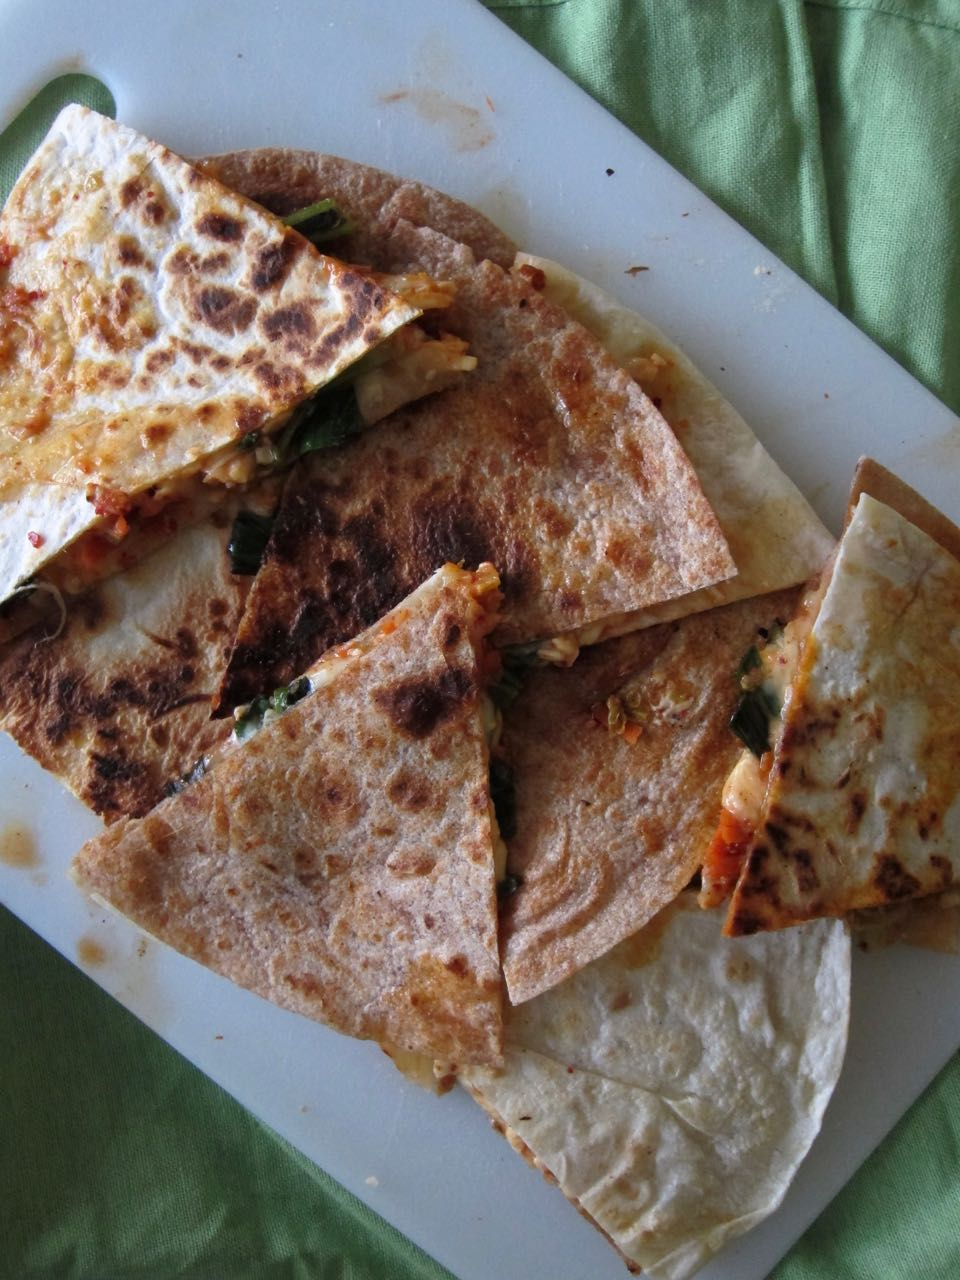 Charred Scallion, Kimchi & Cheese quesadillas